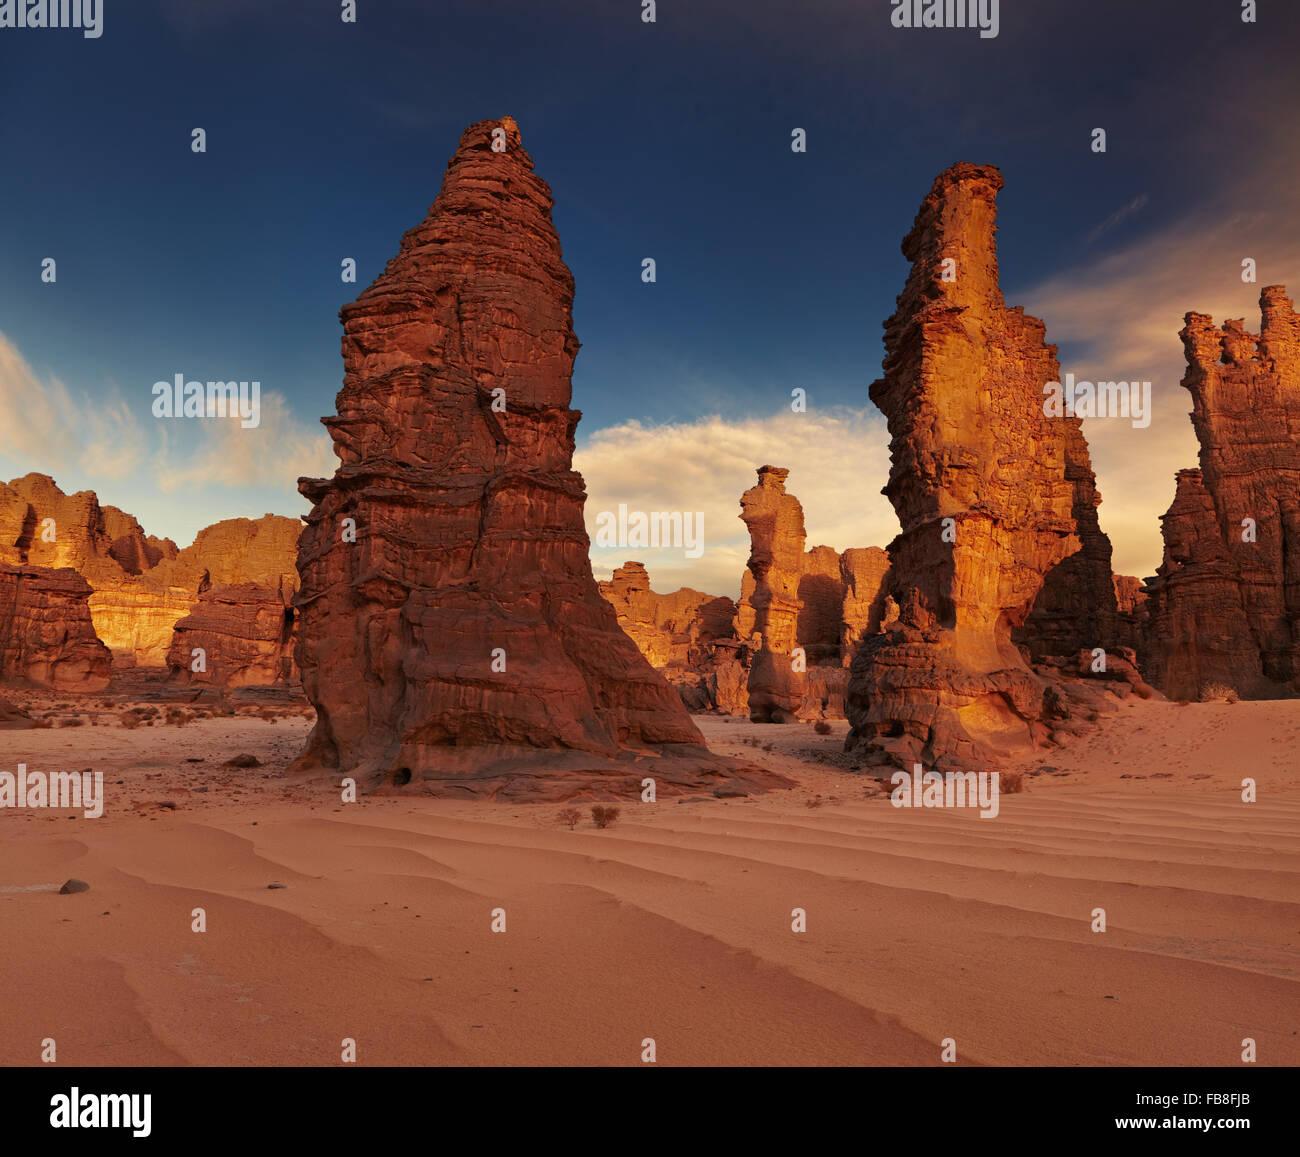 Las rocas del desierto del Sahara, de Tassili N'Ajjer, Argelia Imagen De Stock